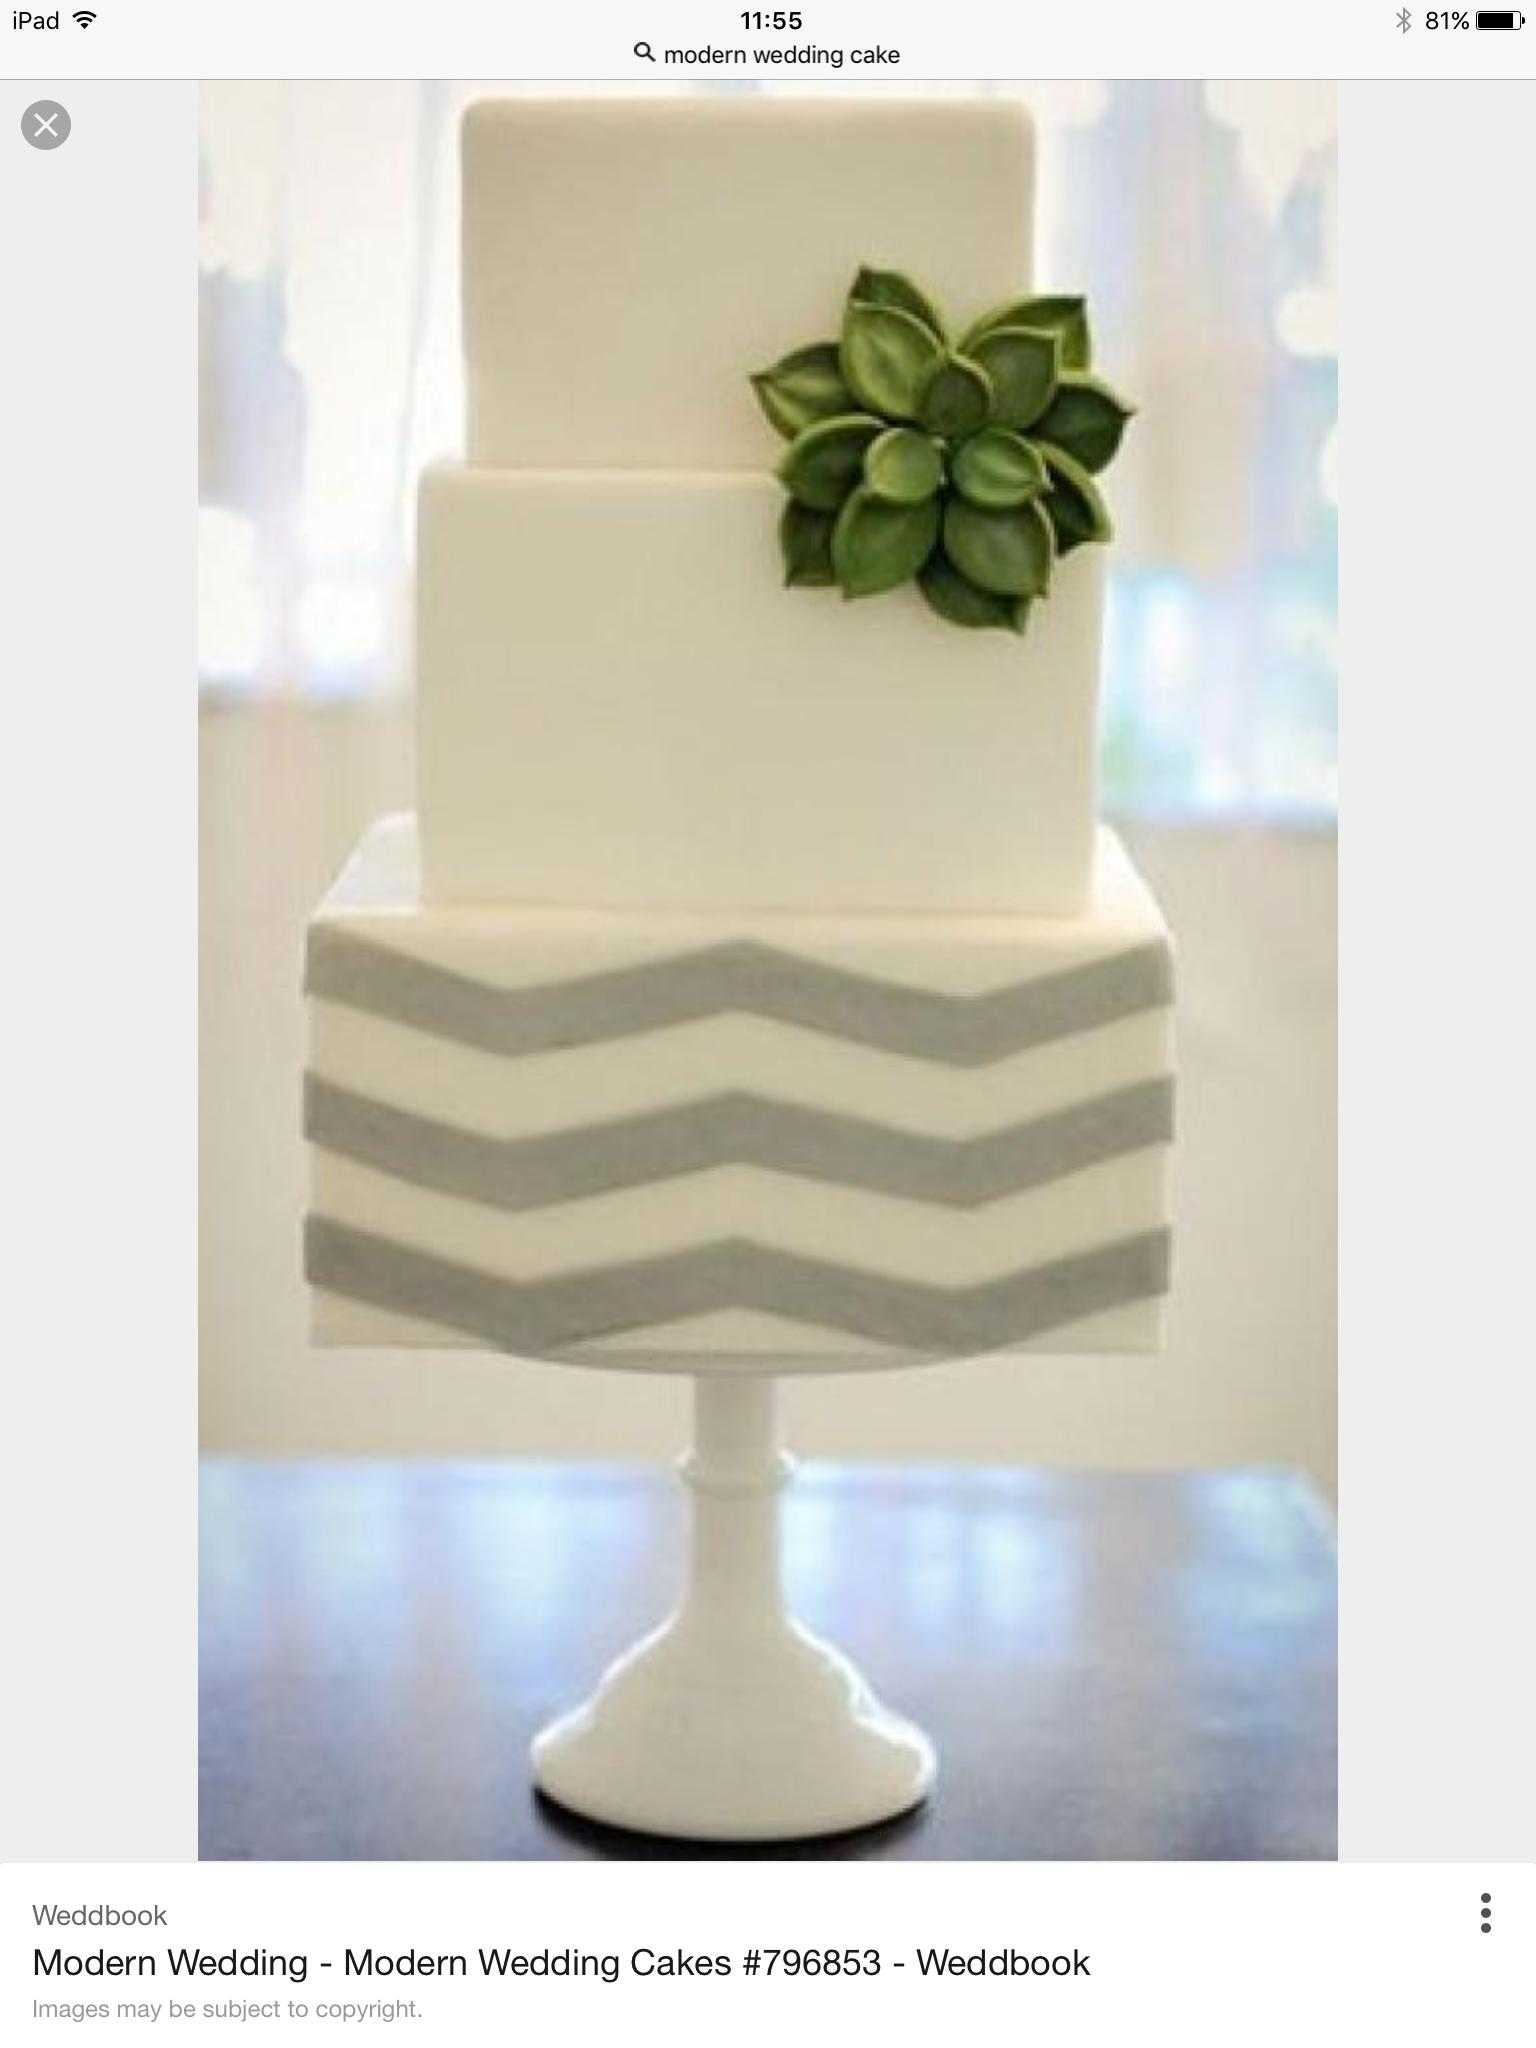 Pin by katherine on cake ideas pinterest